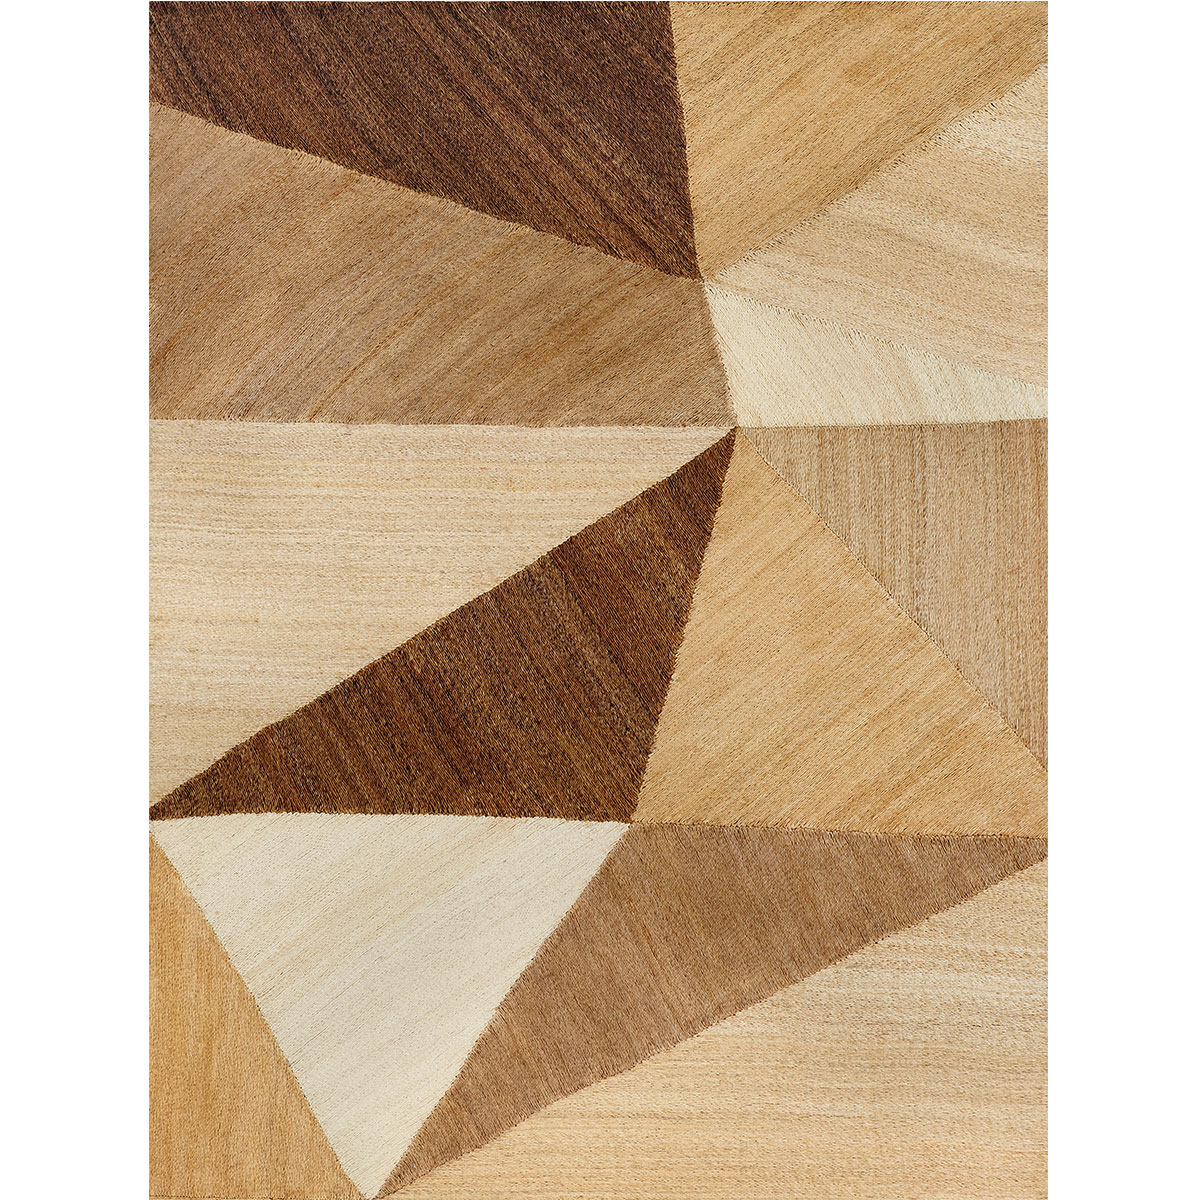 cubist_abaca_hand-woven_patterson-flynn-martin_pfm